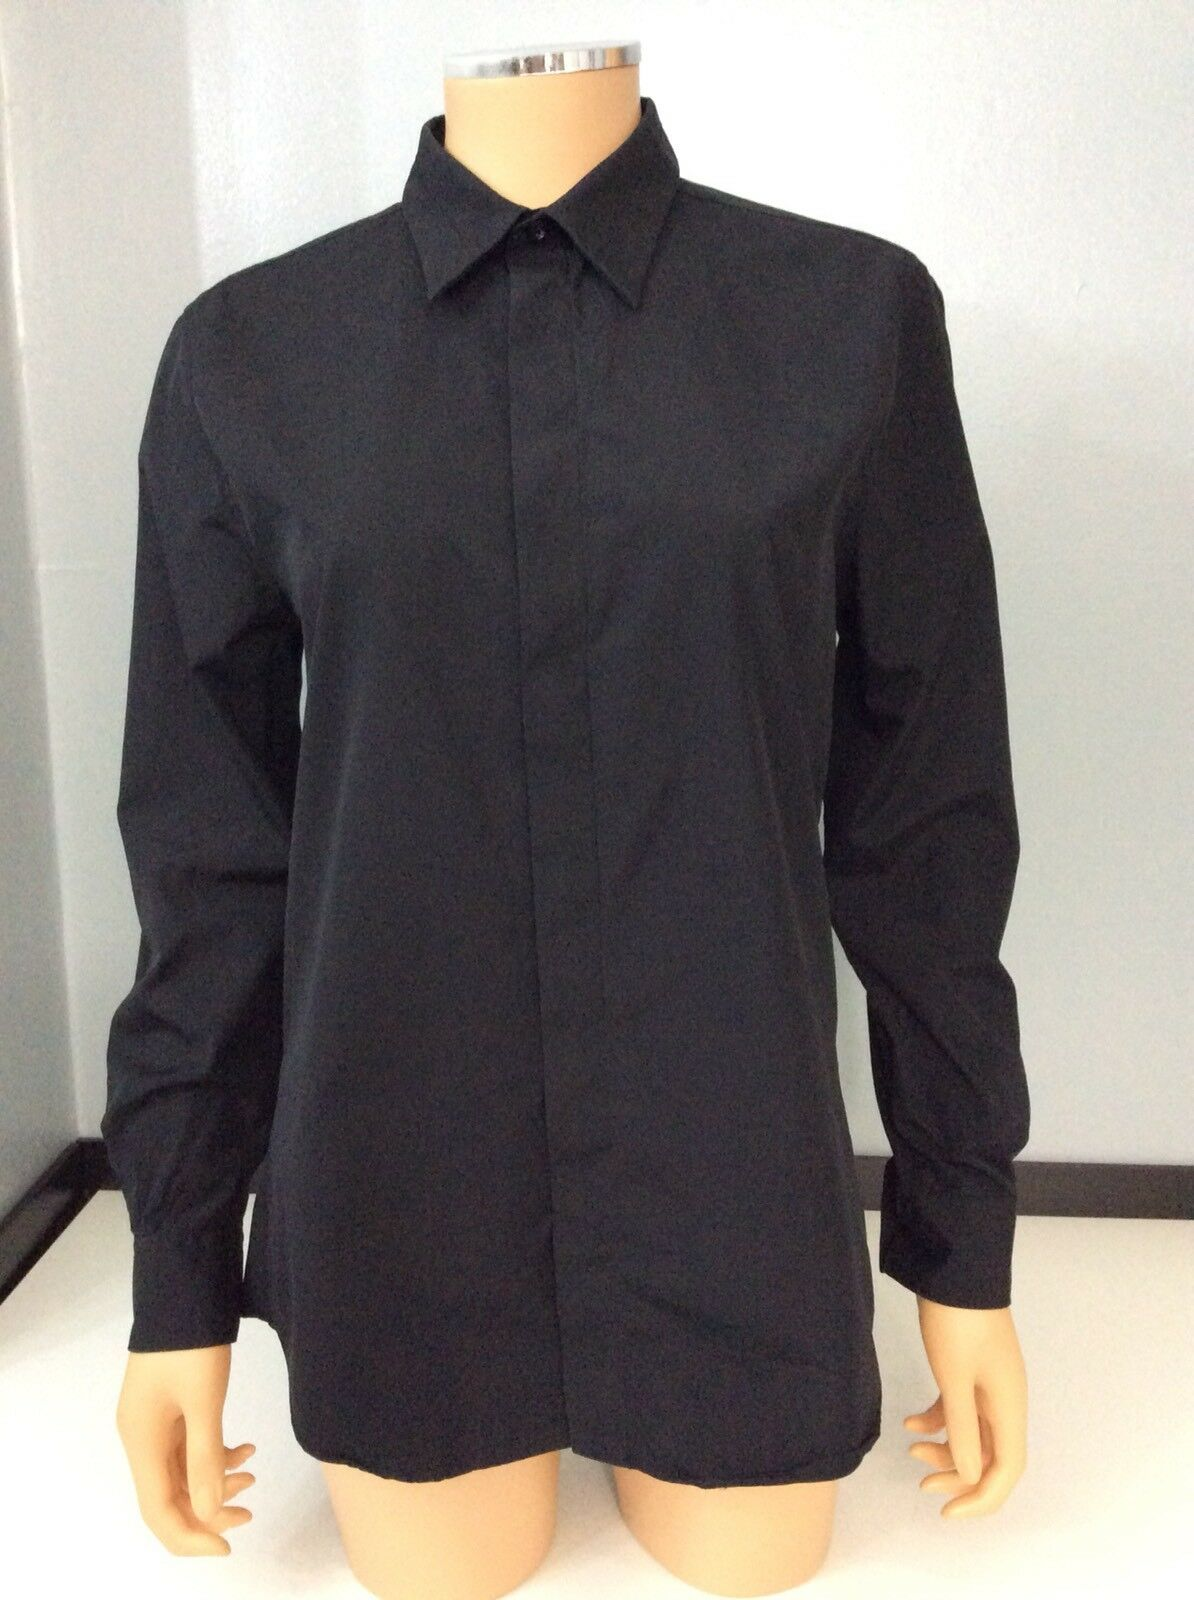 Givenchy Paris schwarz Shirt Blouse top  Größe 38 Collar Vgc Long Sleeve